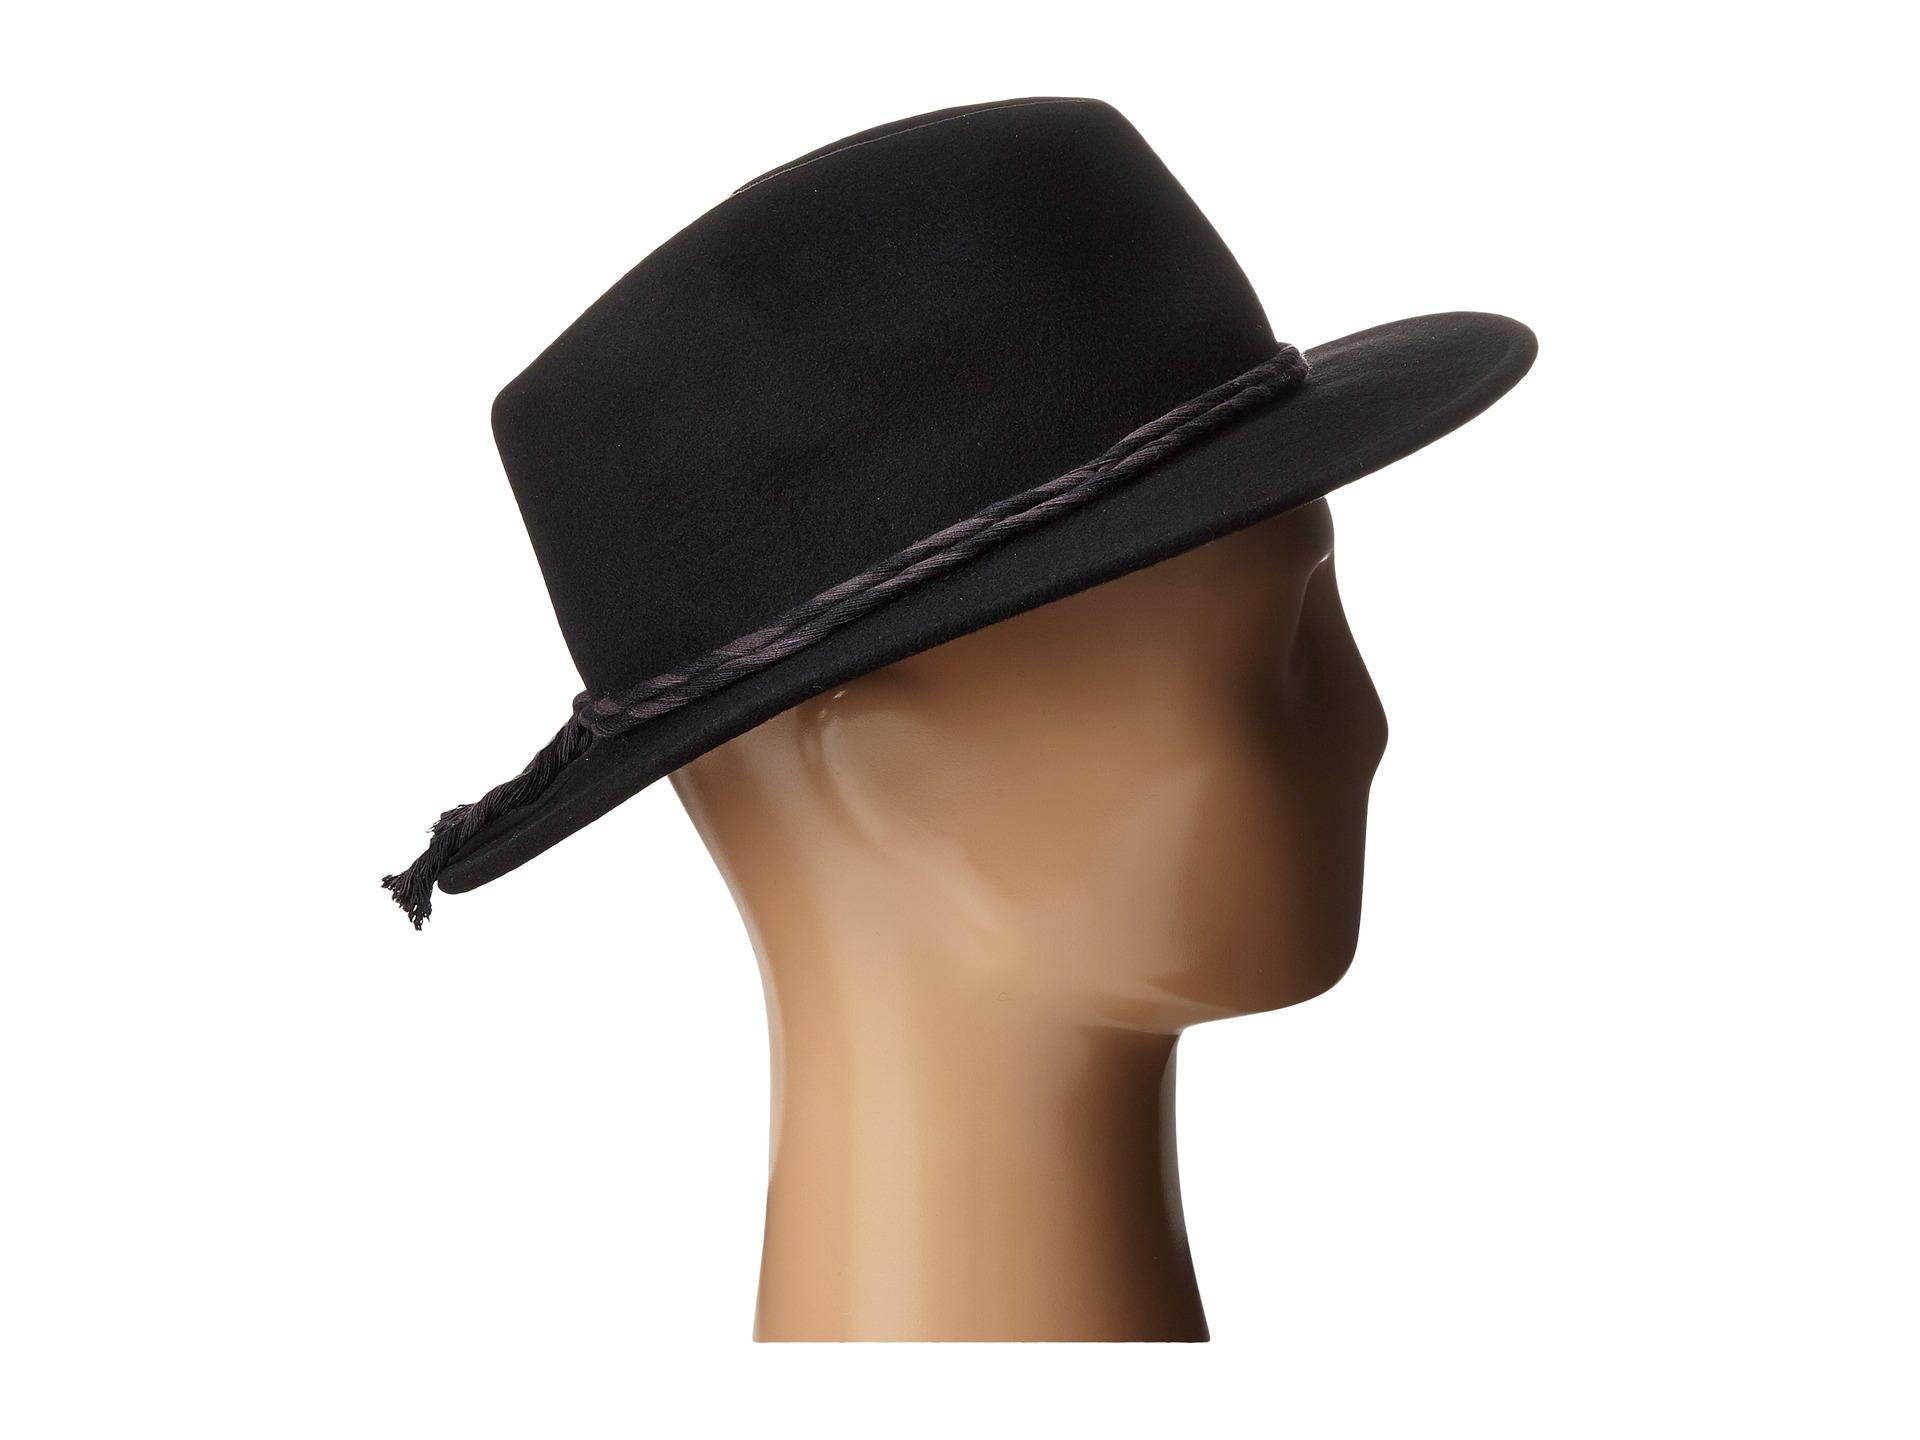 Lyst - Brixton Corbet Fedora in Black for Men 841119599c4